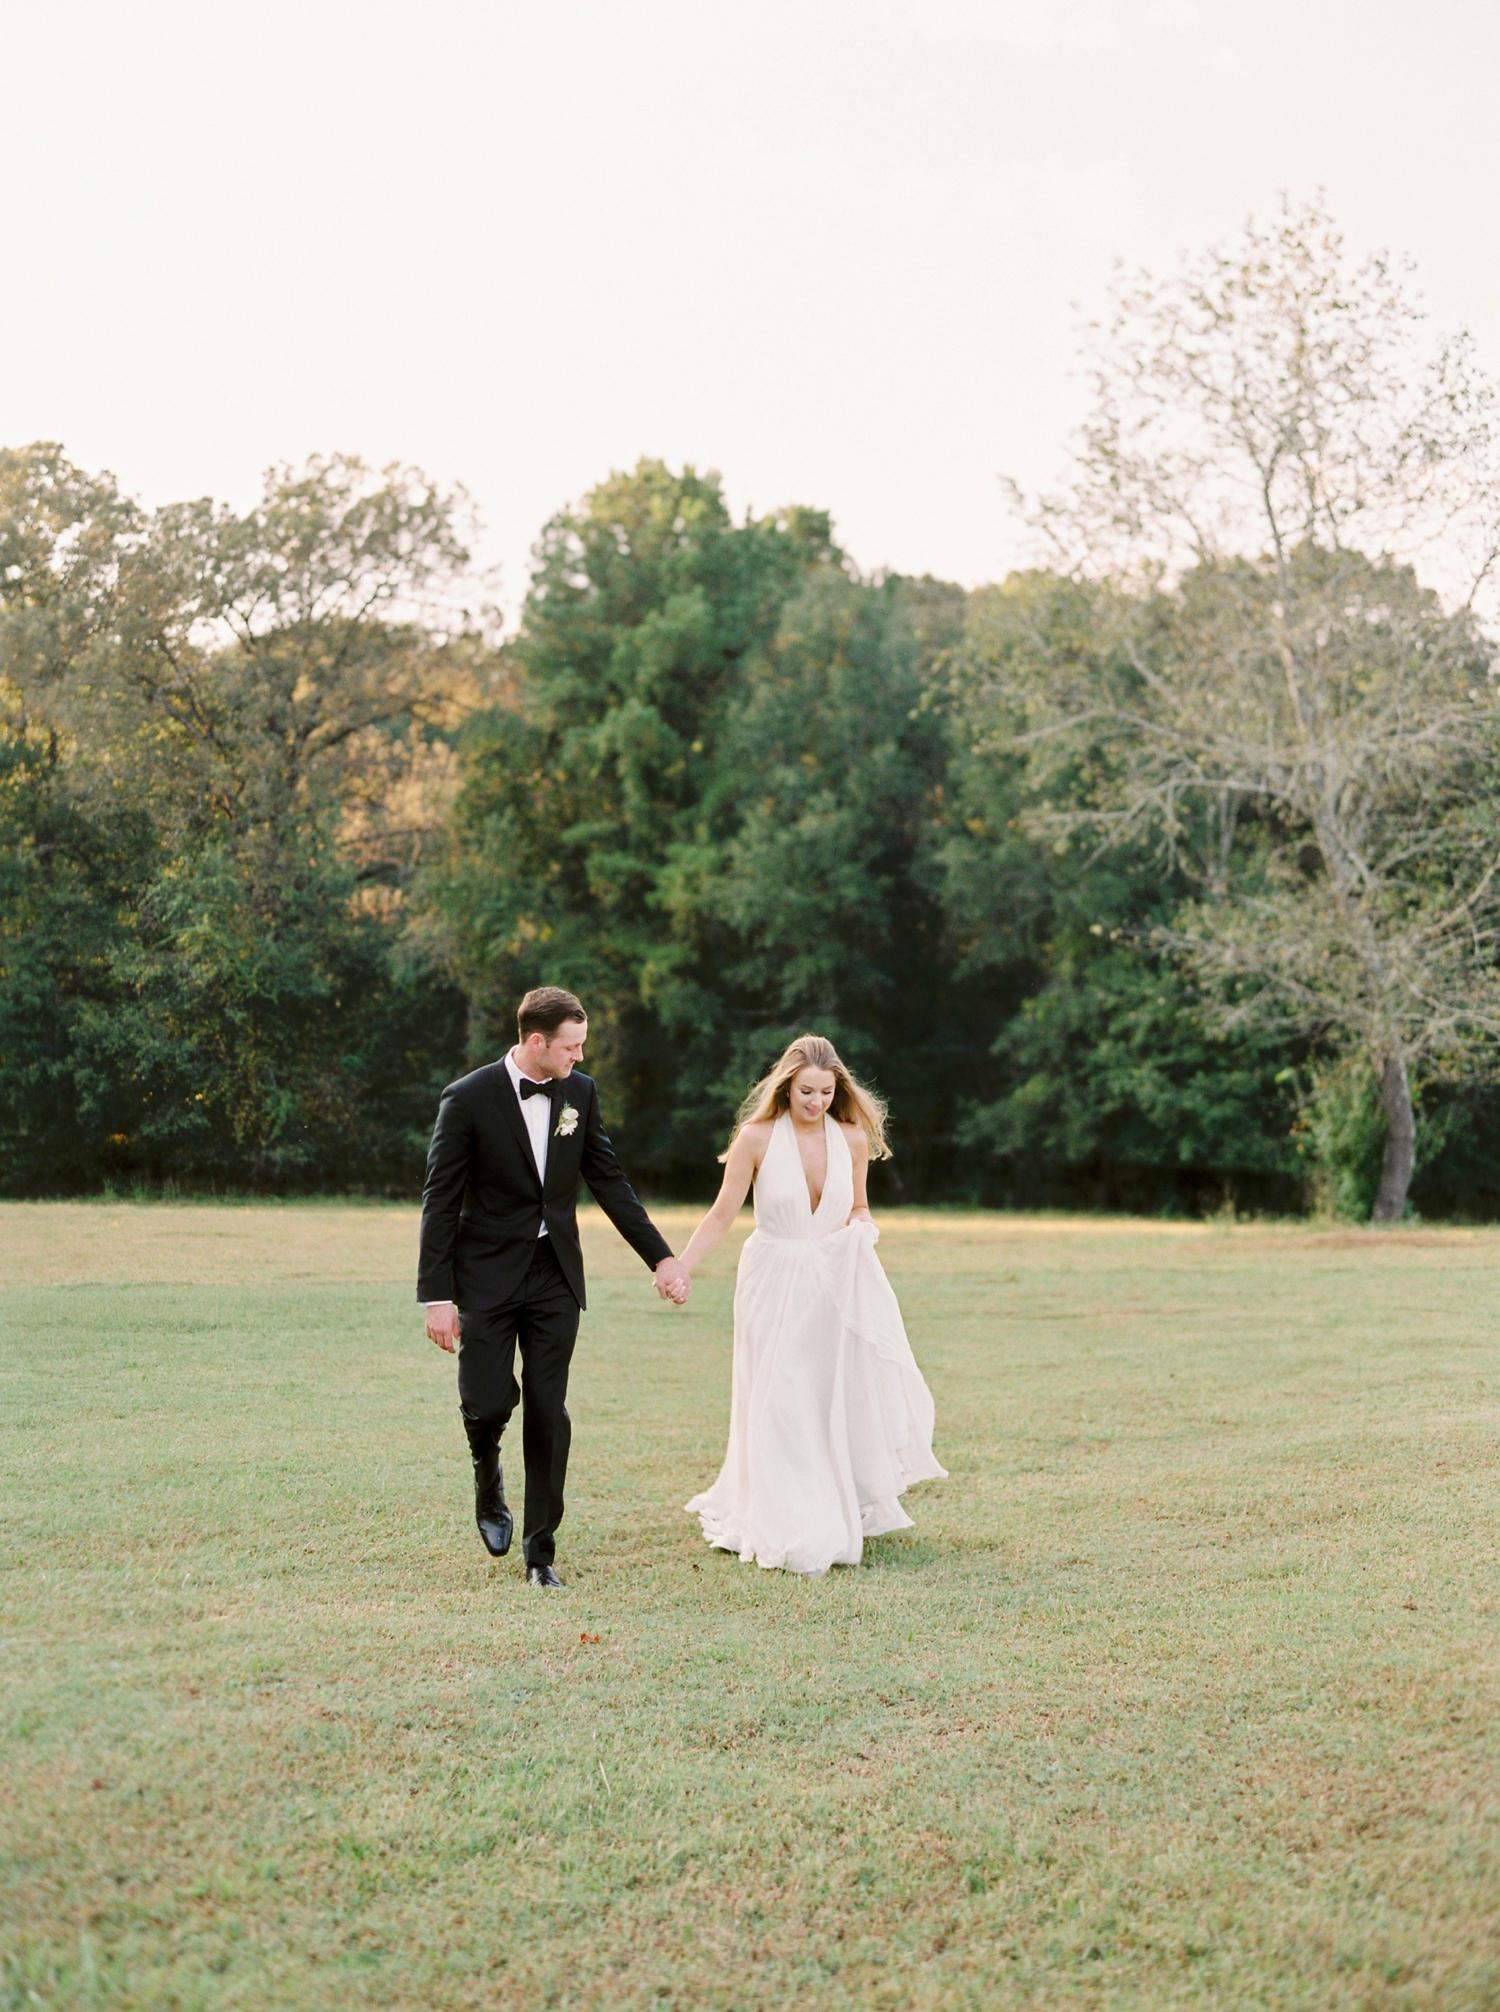 Calgary wedding photographers | georgia wedding photographers | fine art film | Justine Milton Photography | georgia wedding | bride and groom portraits | pastel wedding inspiration